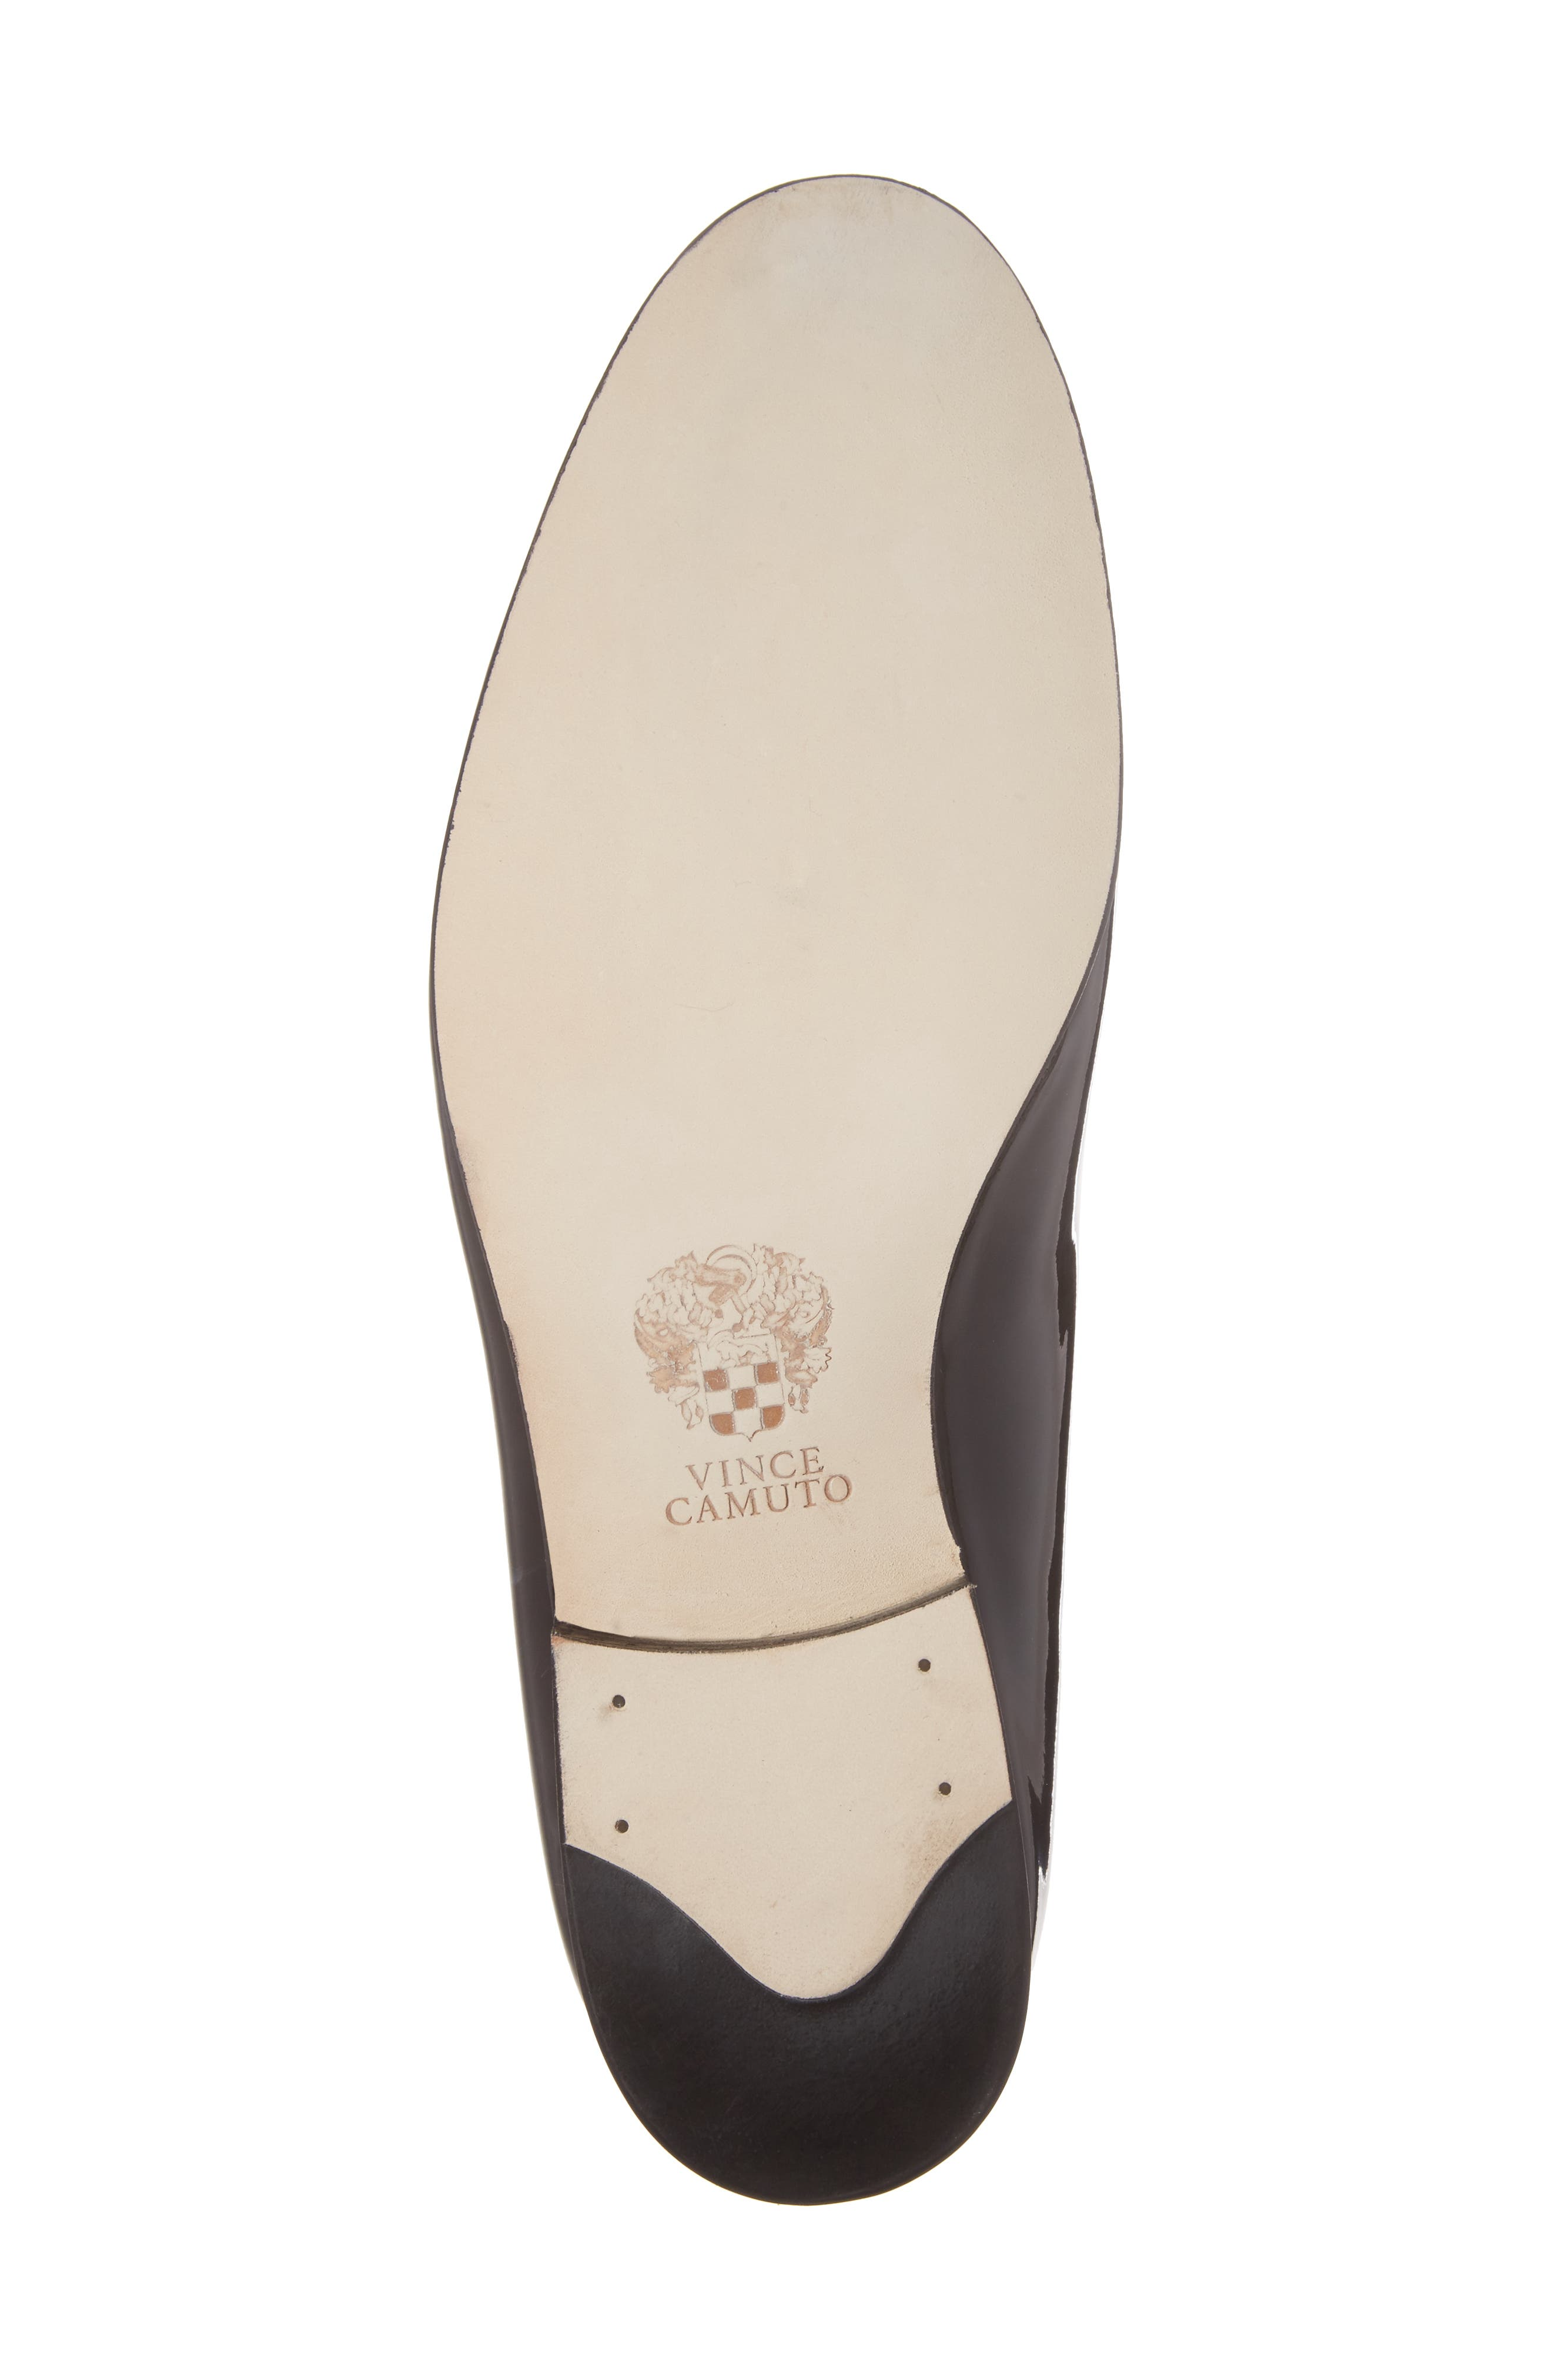 Bravi Loafer,                             Alternate thumbnail 6, color,                             Black Patent Leather